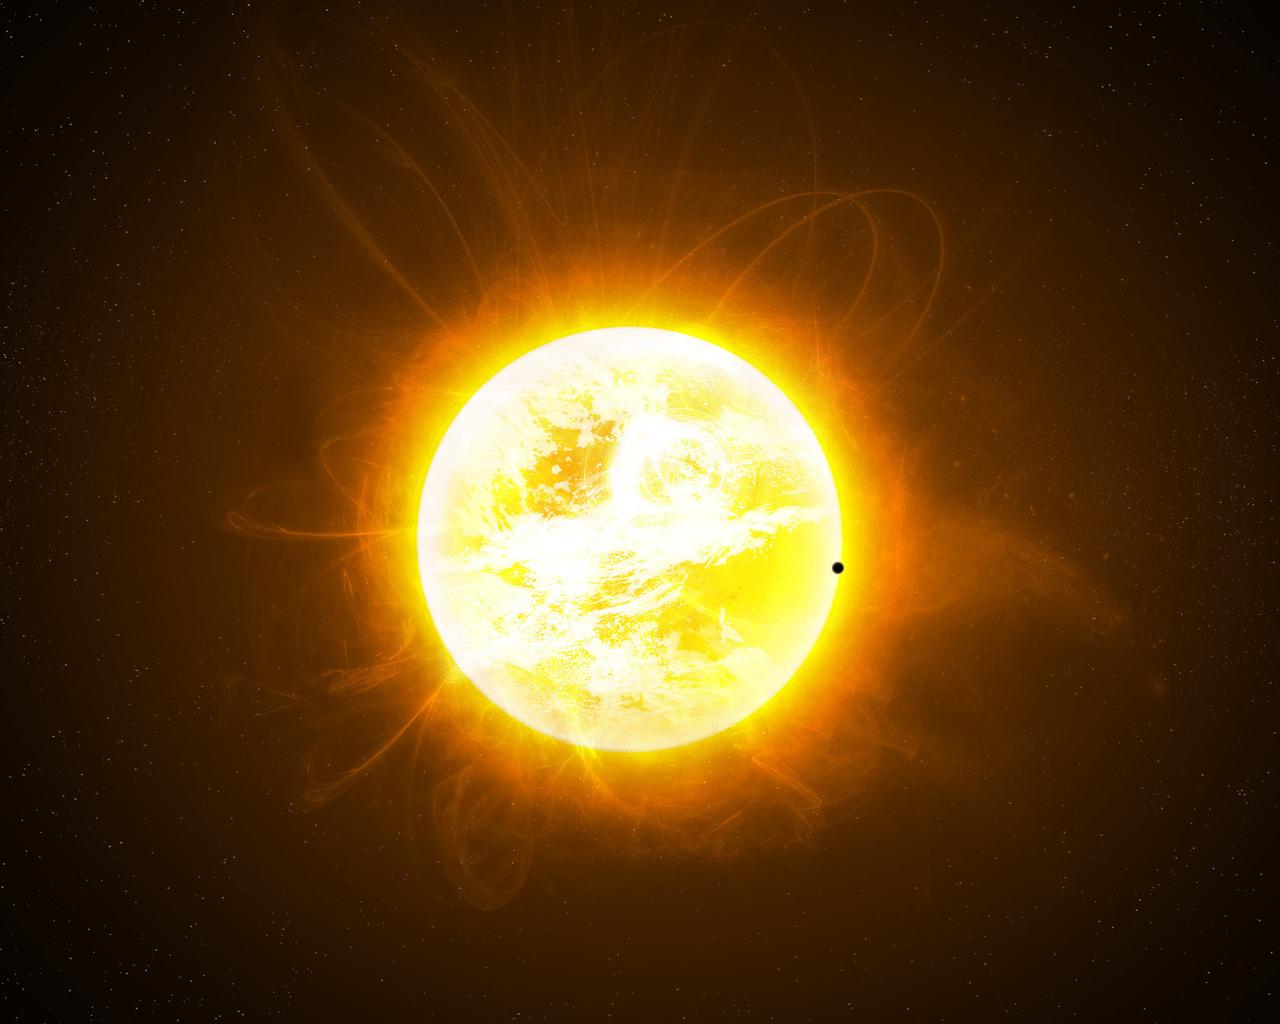 Солнце на рабочий стол фото 184-981